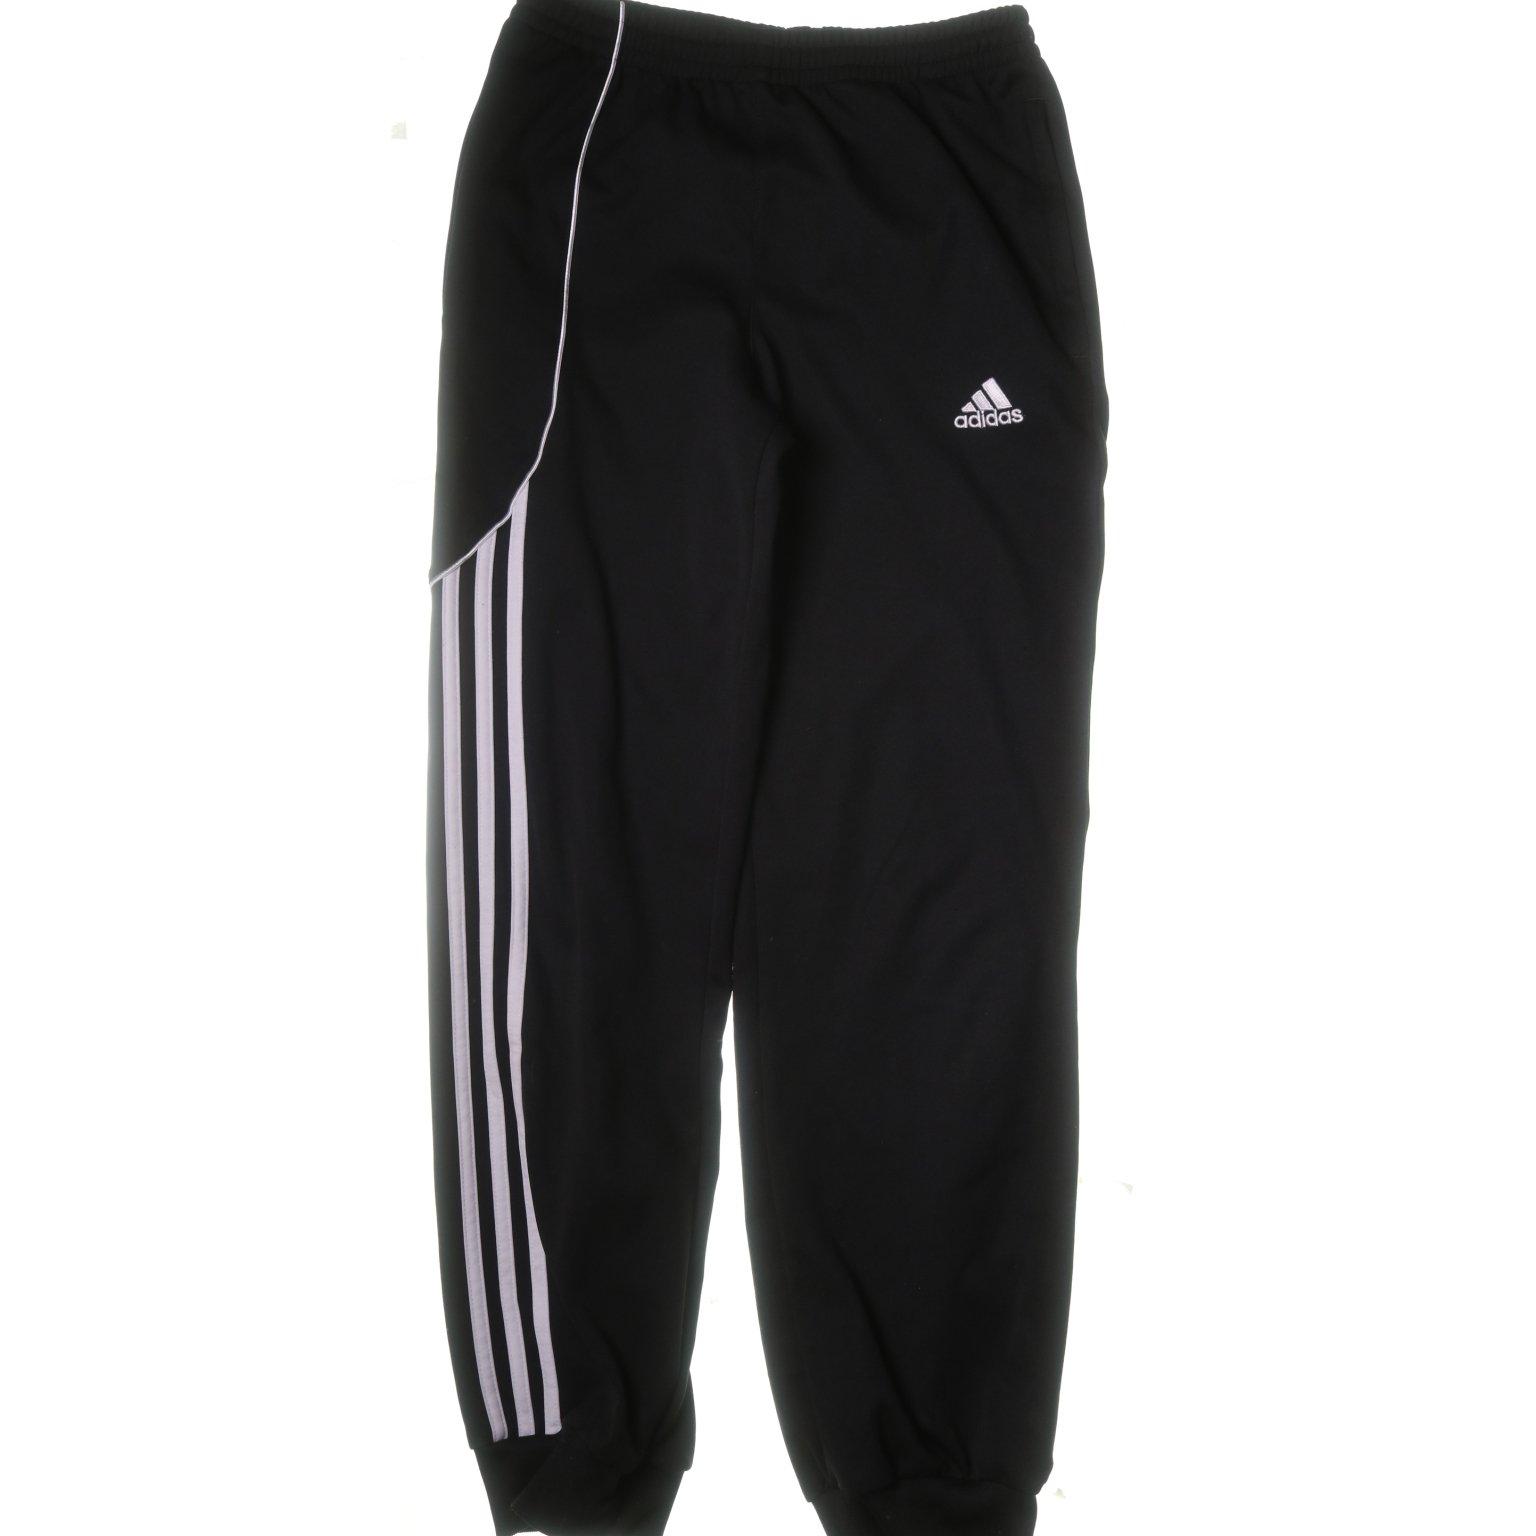 Adidas, Byxor, Strl: 152, Svart